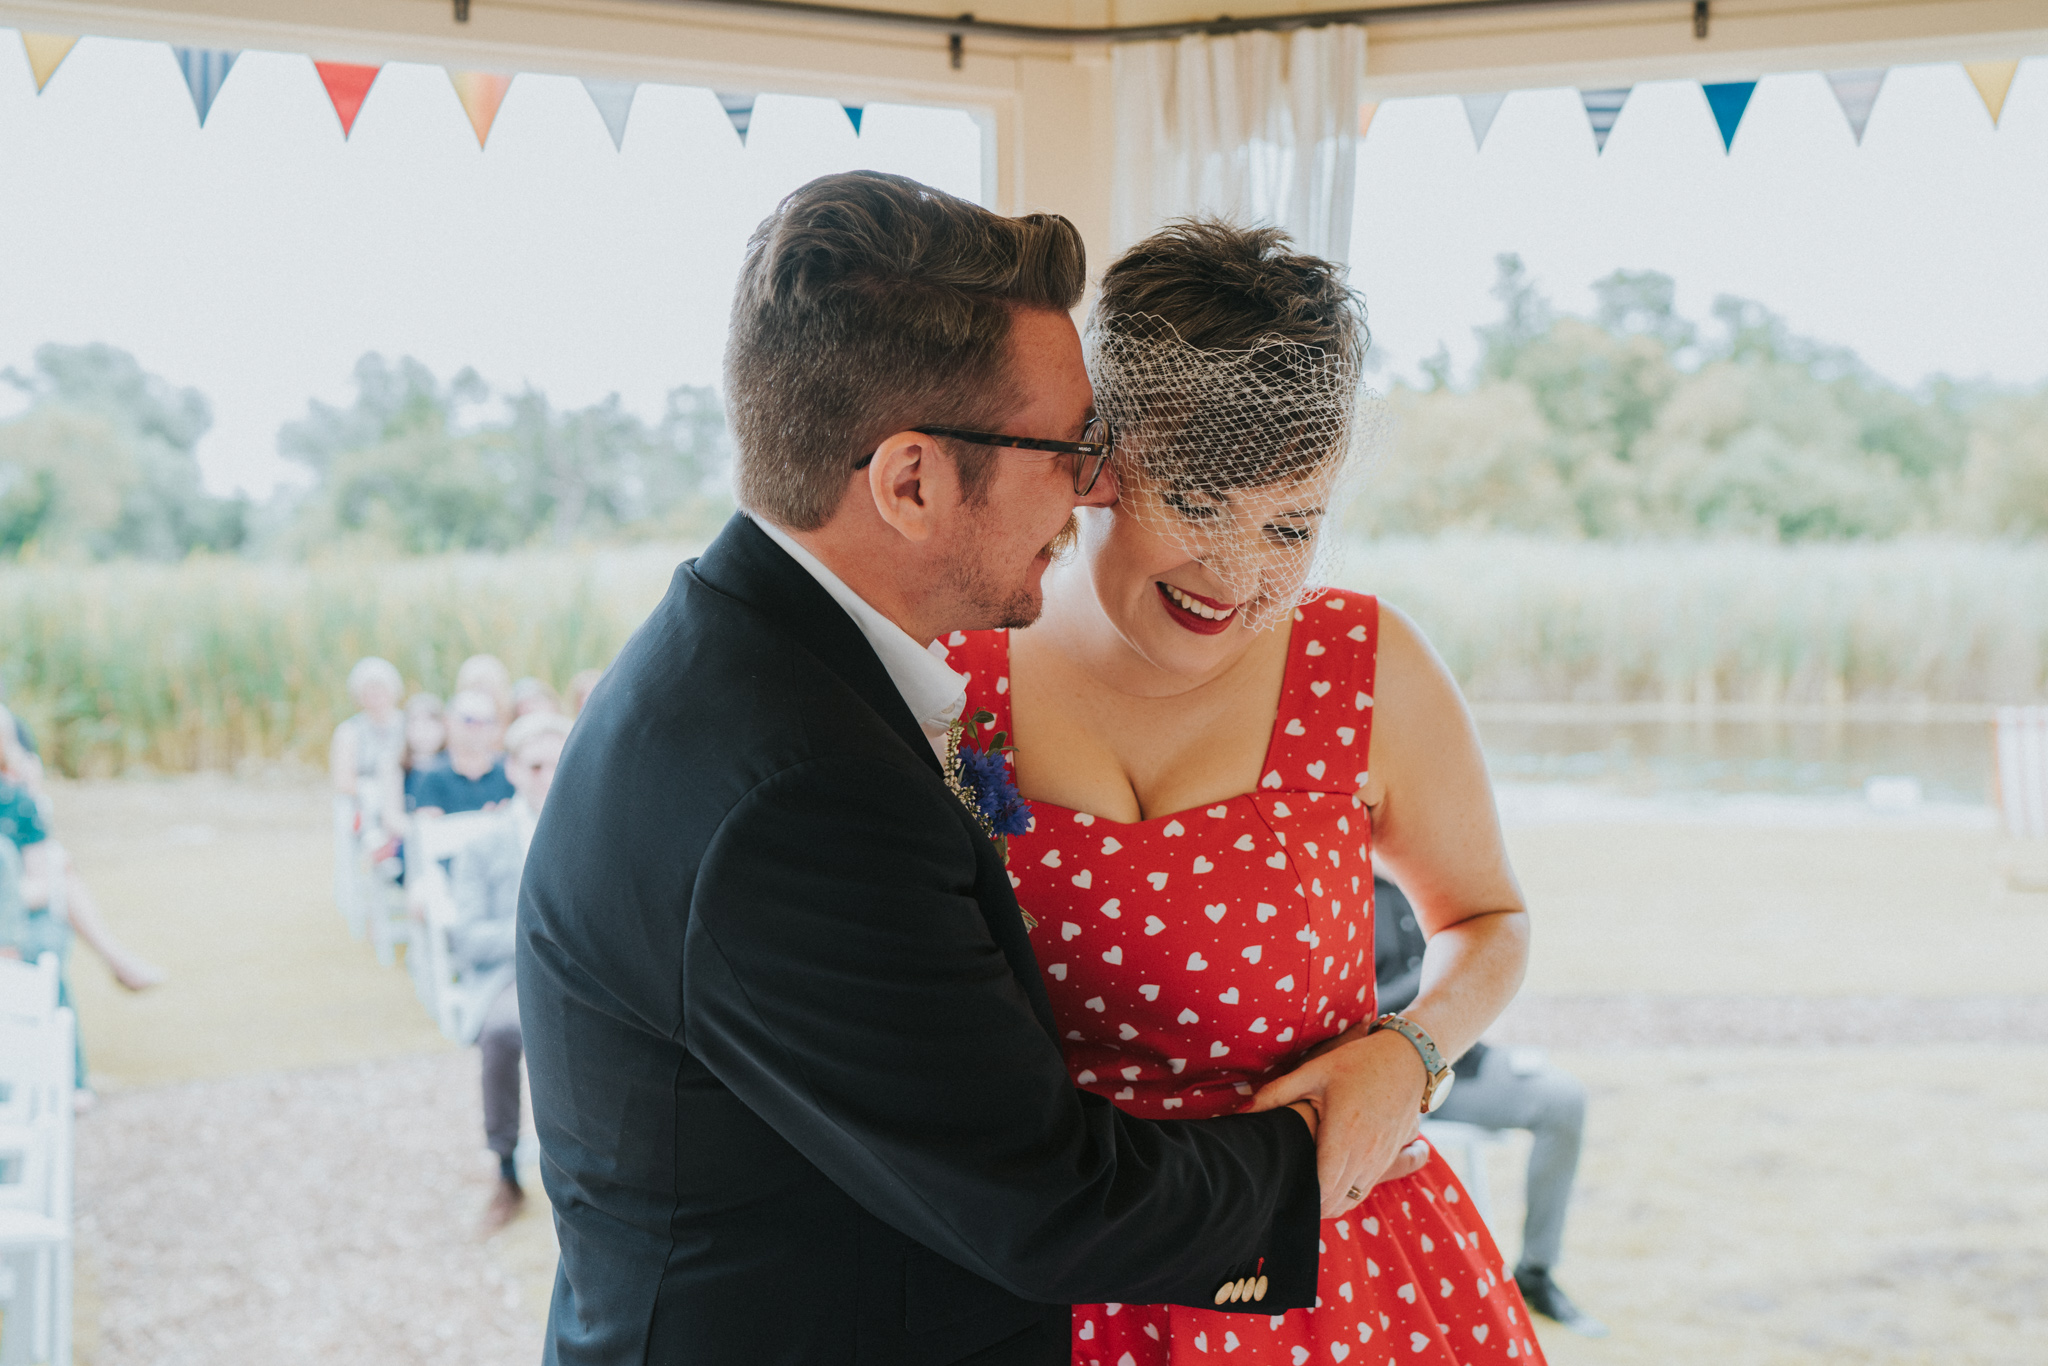 hannah-anthony-thorpeness-retro-diy-50s-wedding-grace-elizabeth-colchester-essex-alternative-wedding-lifestyle-photographer-essex-suffolk-norfolk-devon (14 of 39).jpg